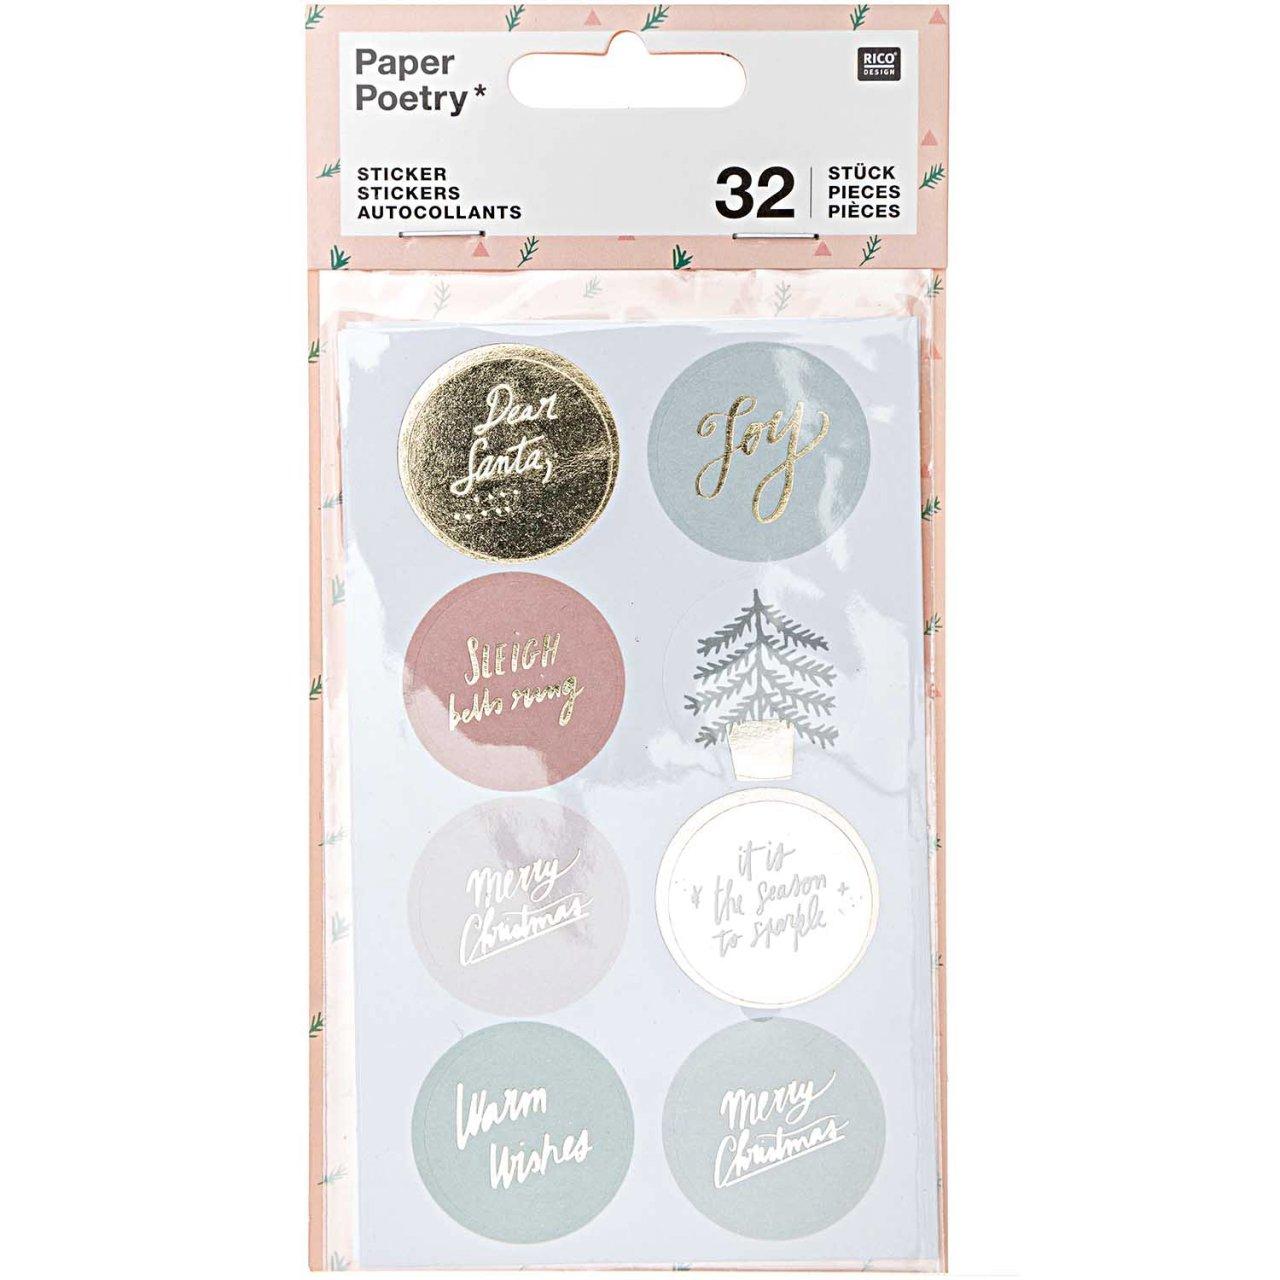 Paper Poetry Sticker Jolly Christmas pastell rund 4 Blatt kaufen »